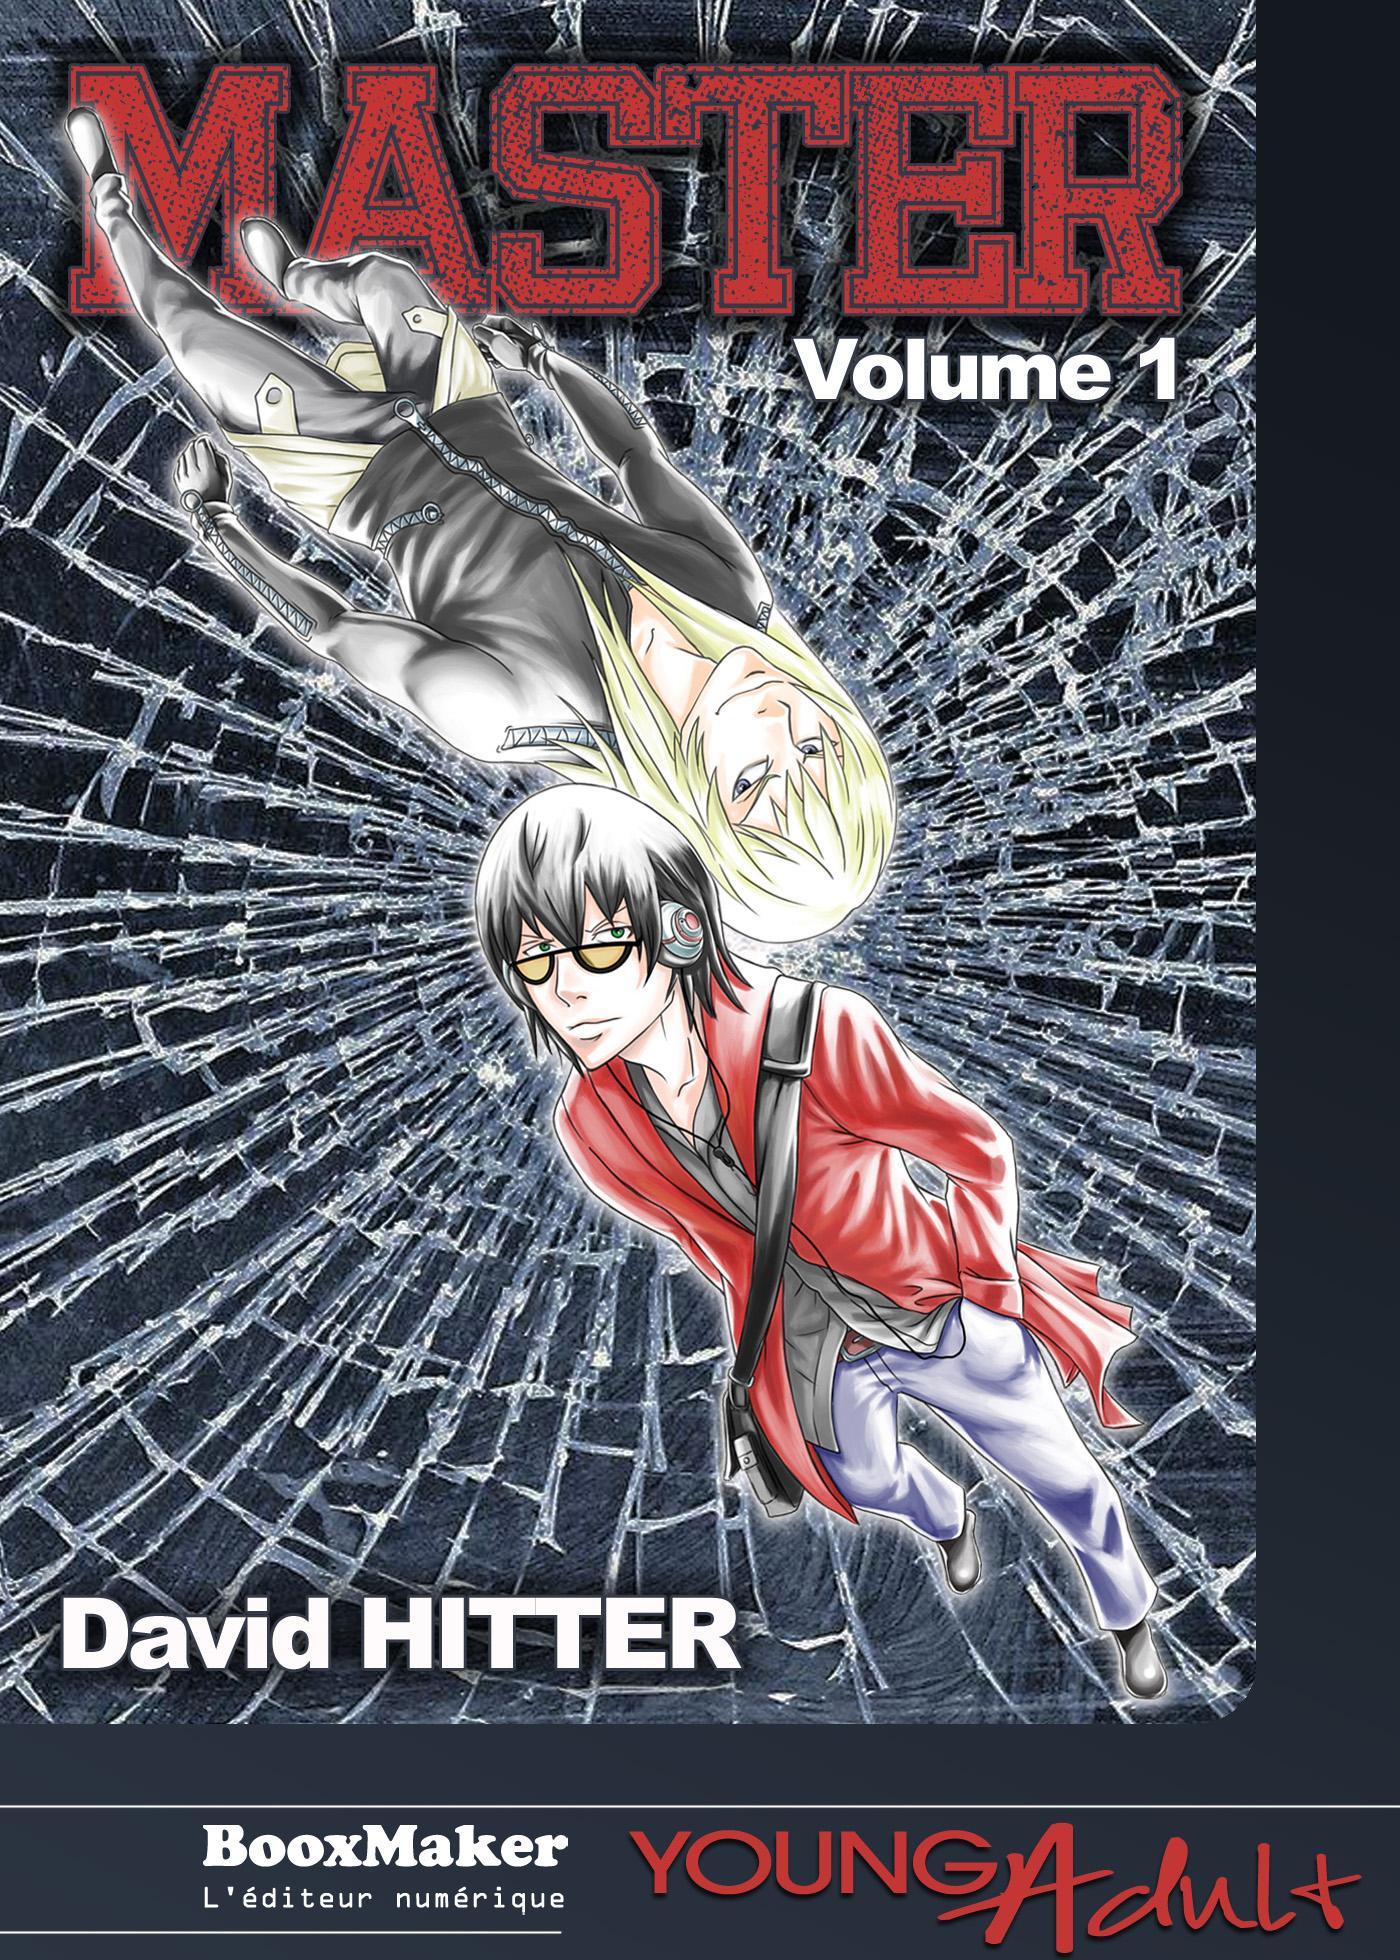 Master, VOLUME 1